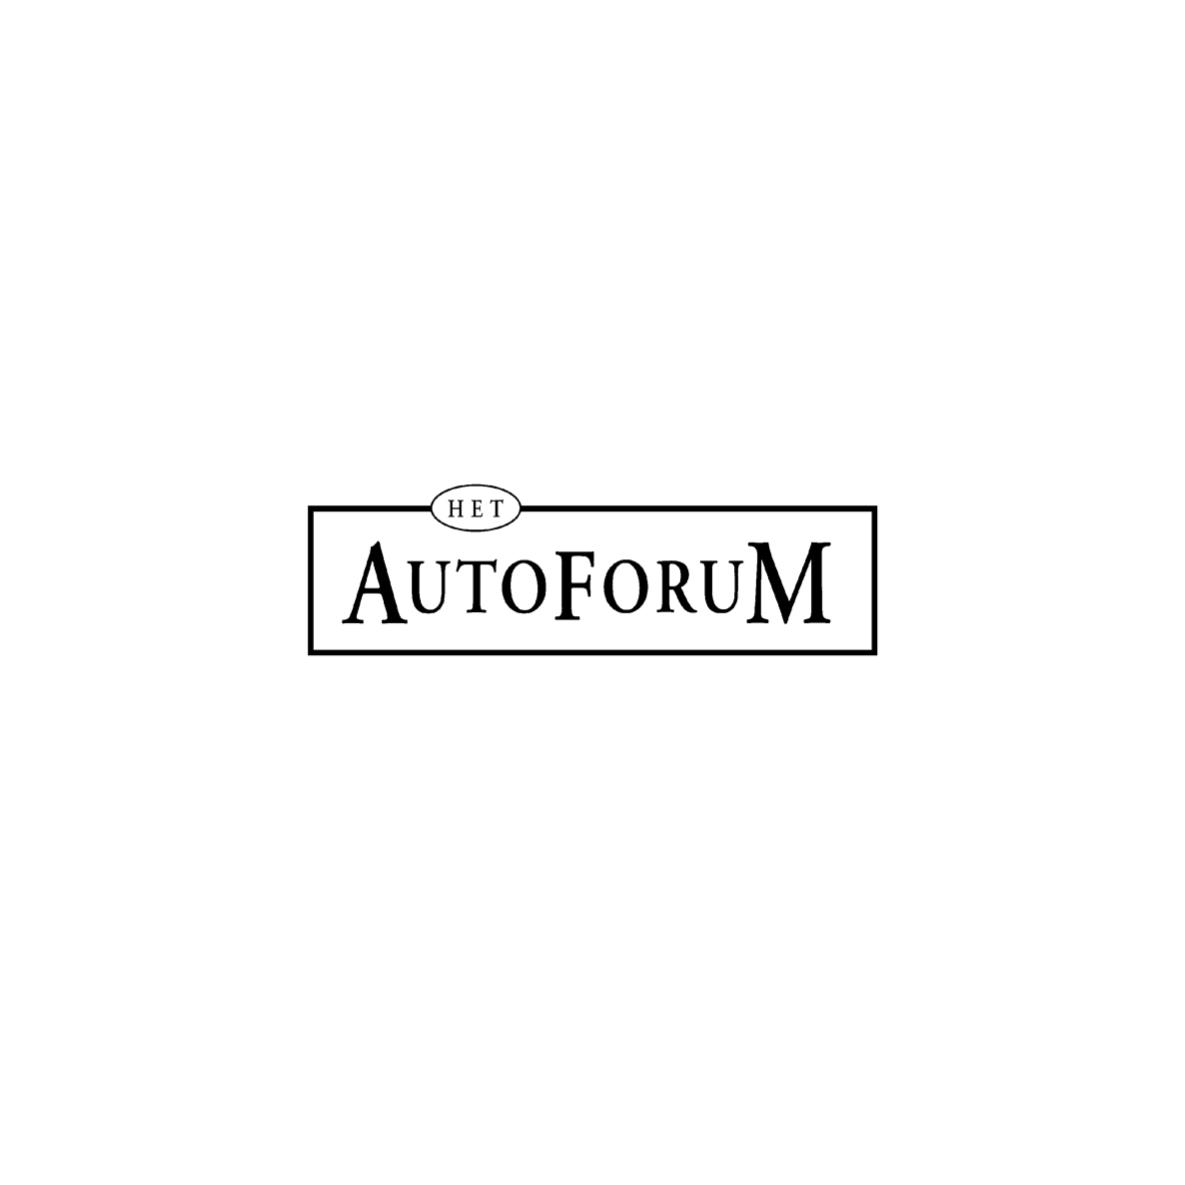 Het Autoforum Borger NL